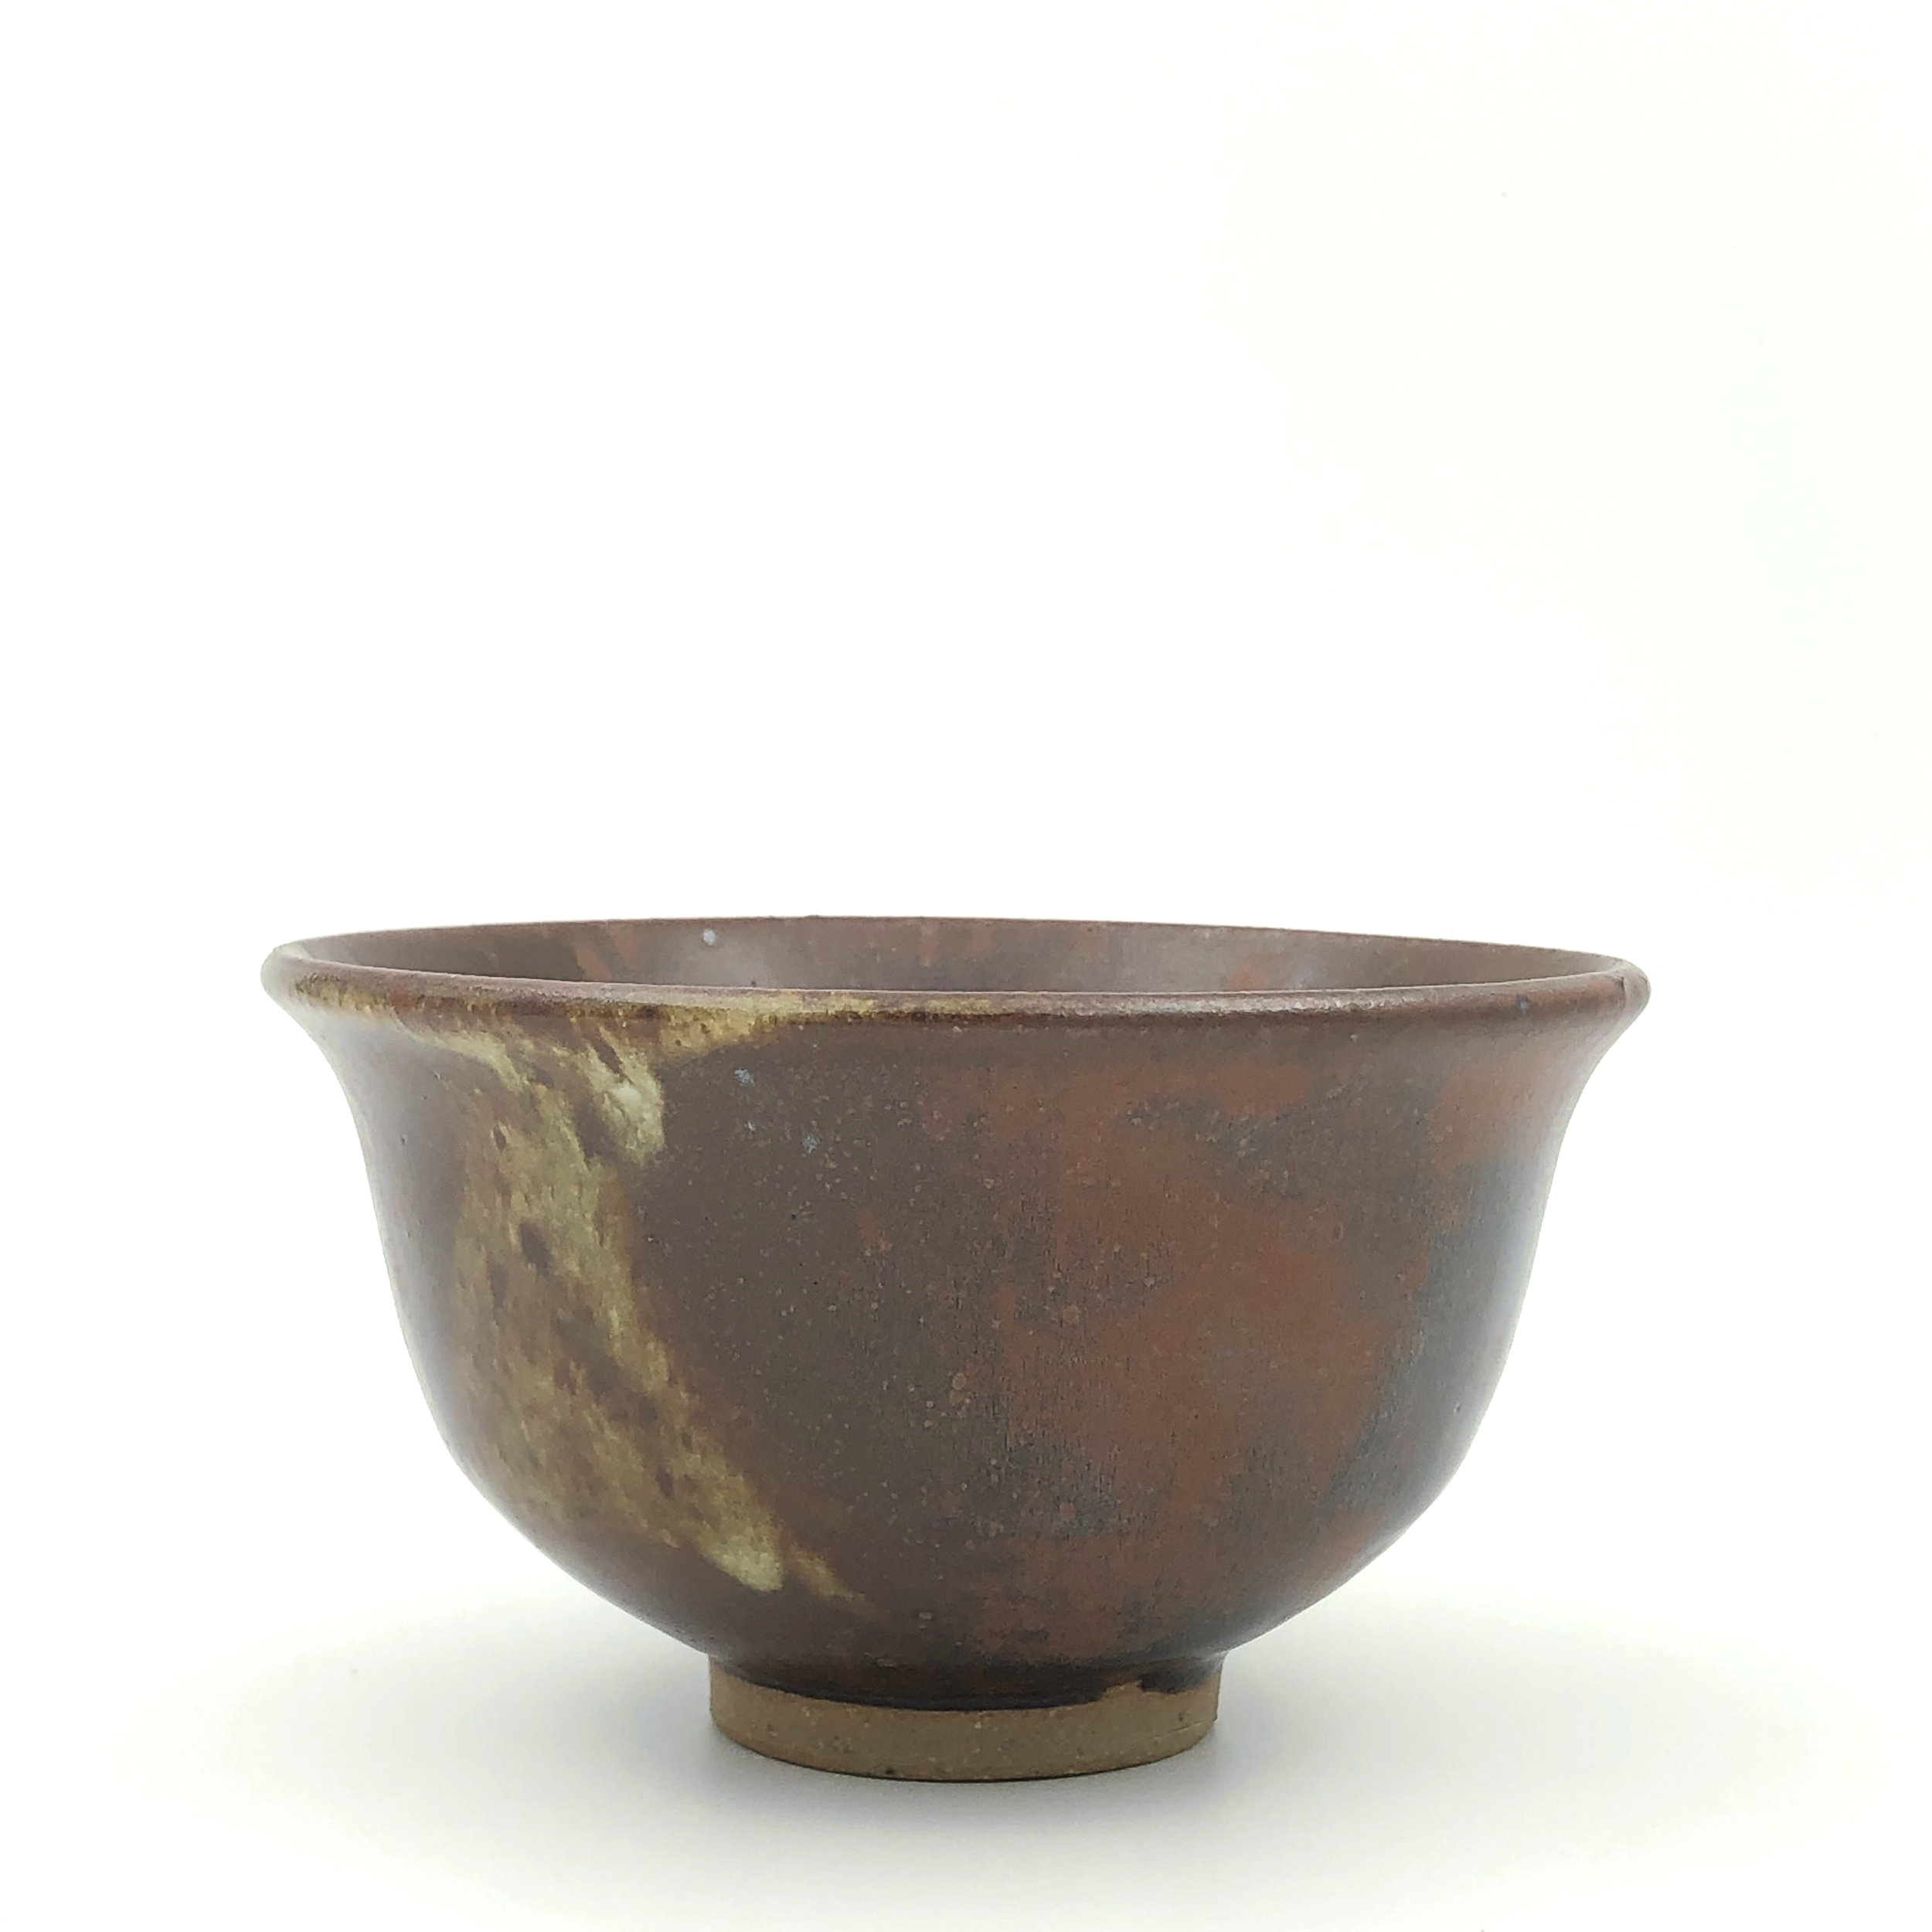 Ceramics III, Bowl